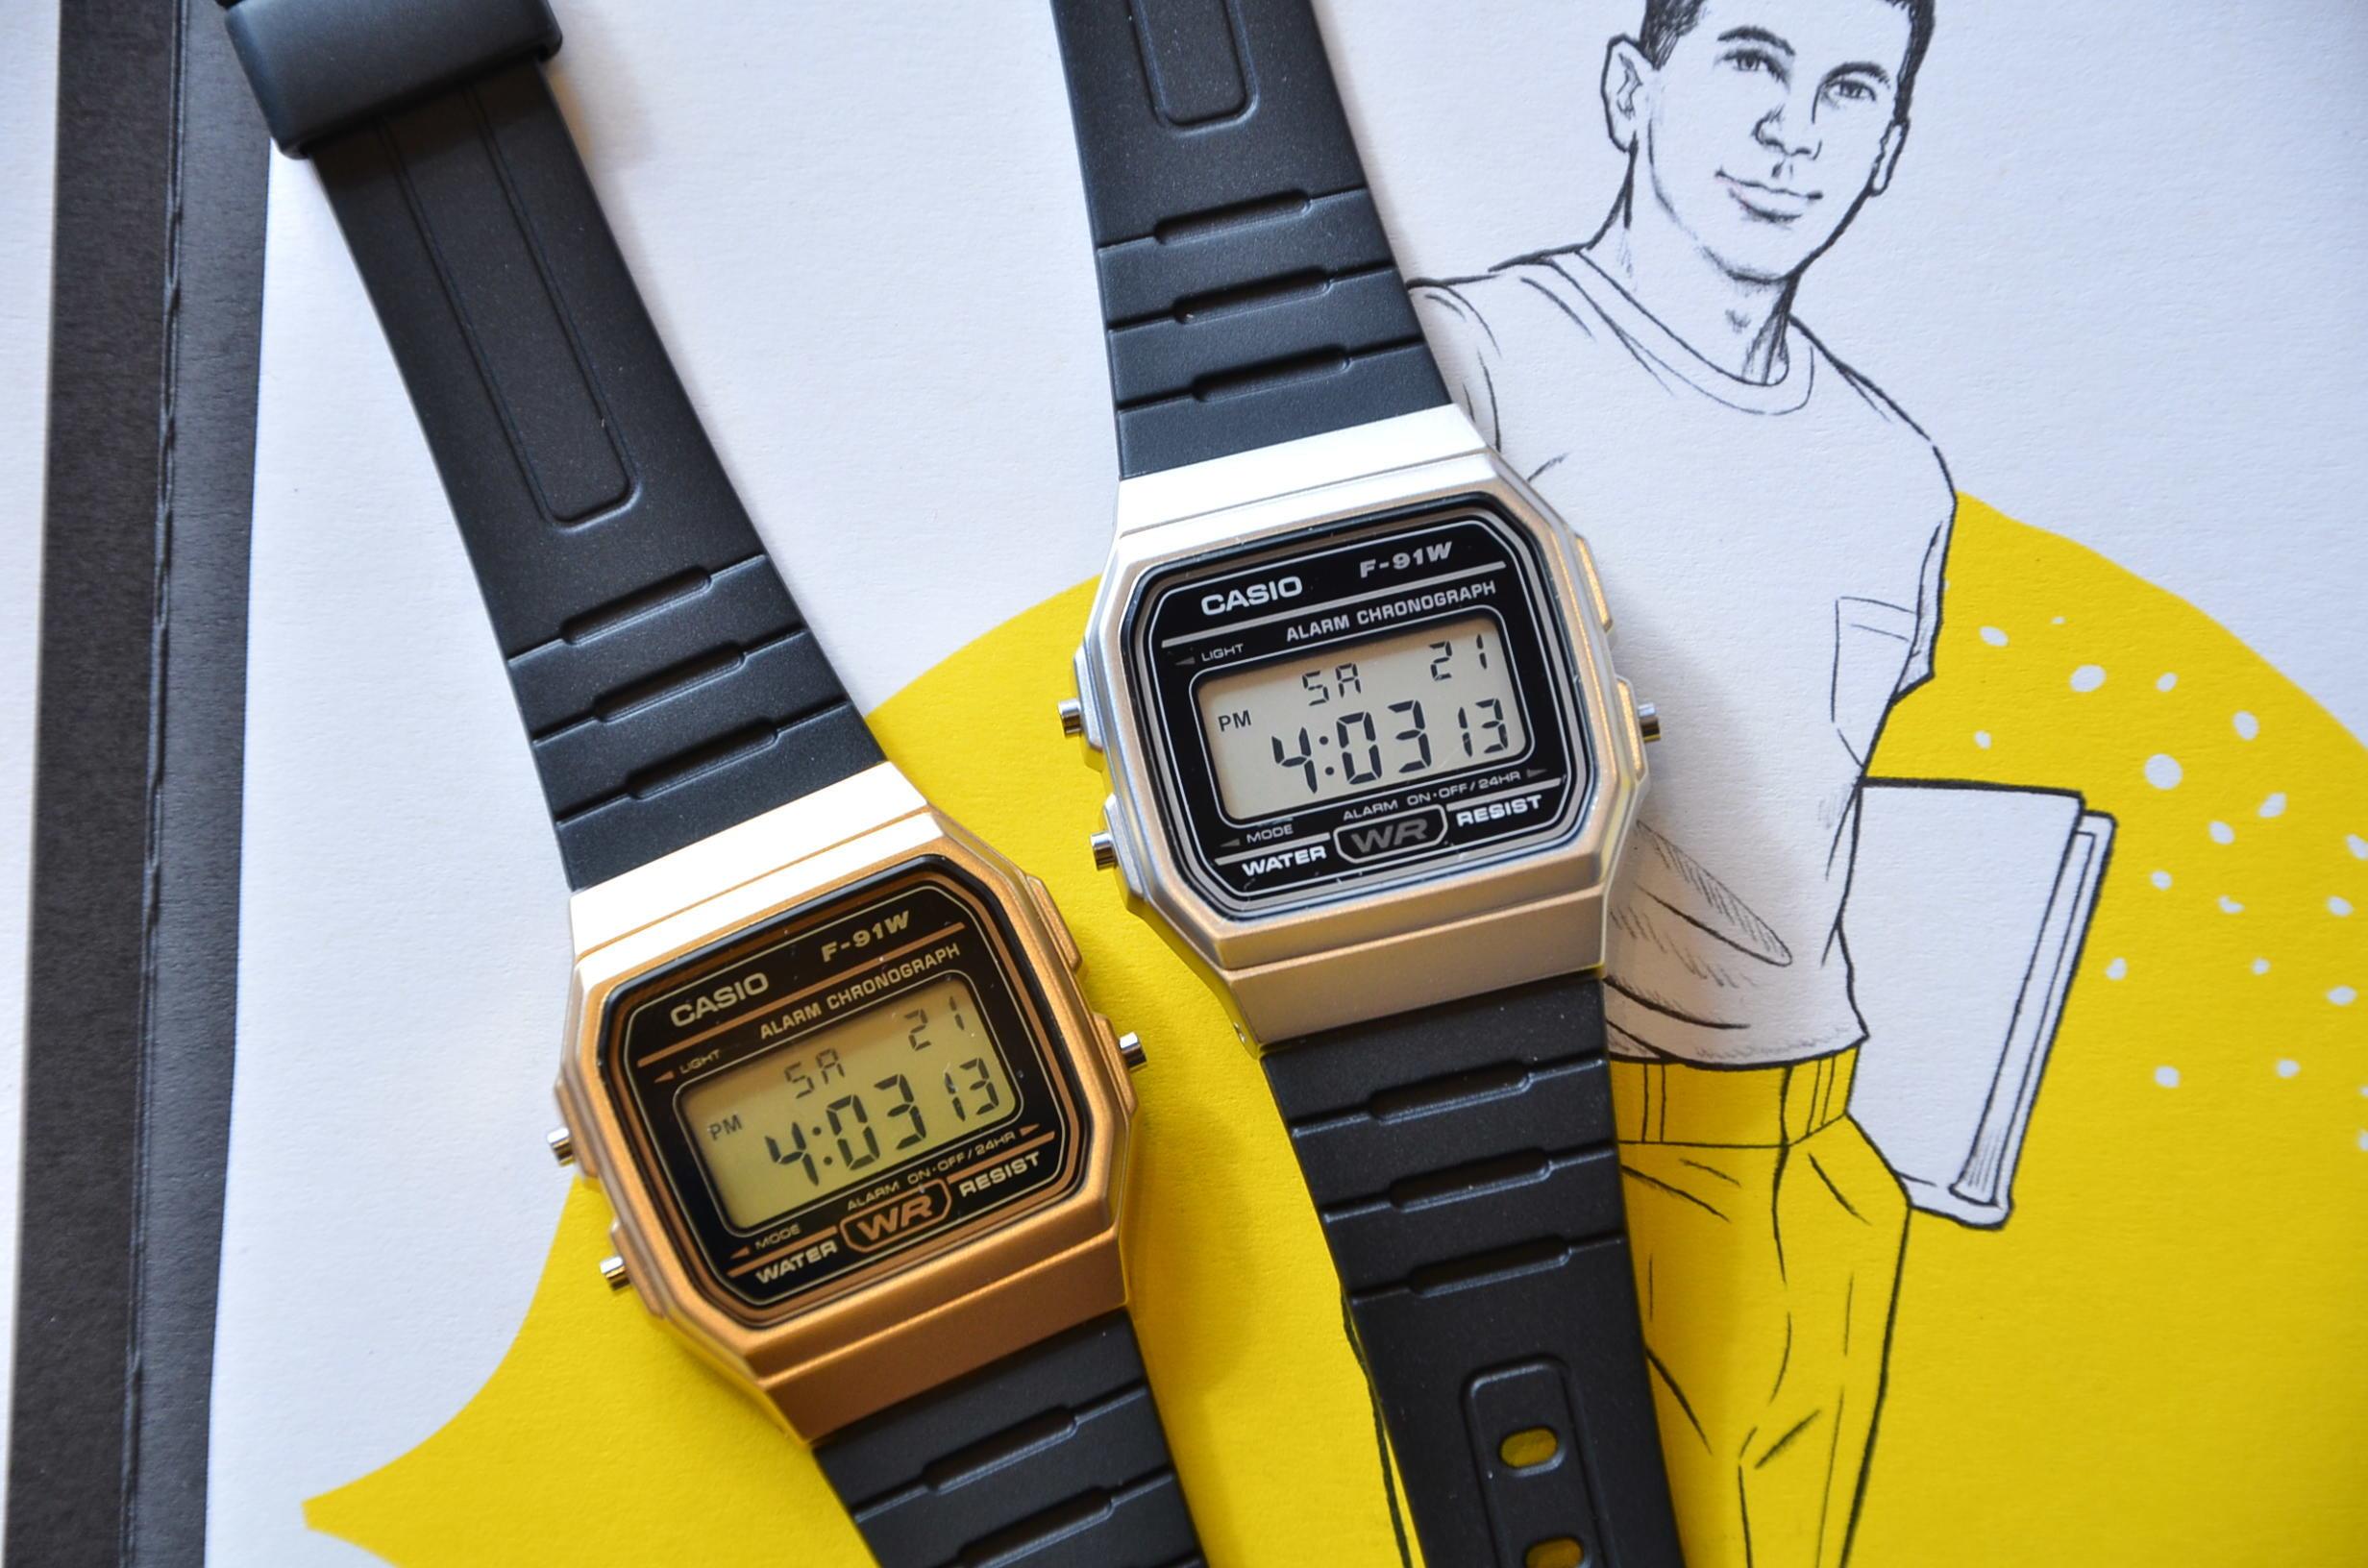 CASIOの時計!!!!_c0167336_18545040.jpg